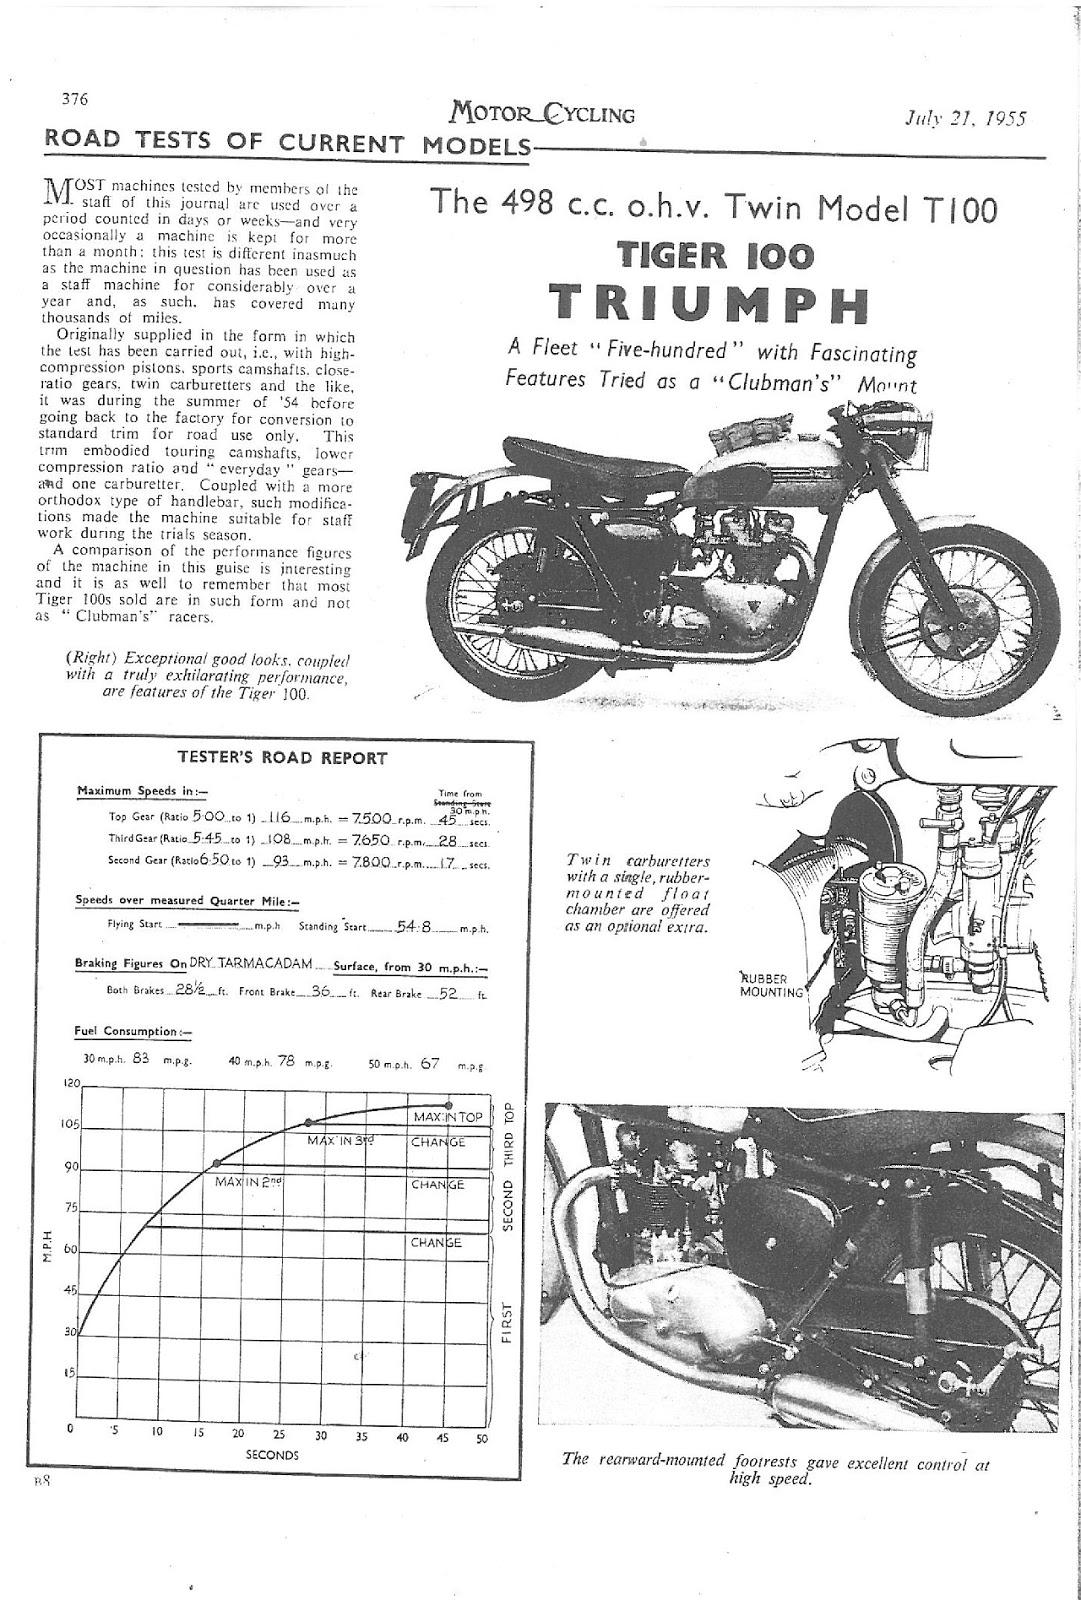 THE ALL ALLOY 500 PRE UNIT TRIUMPHS: Tiger 100 Motor